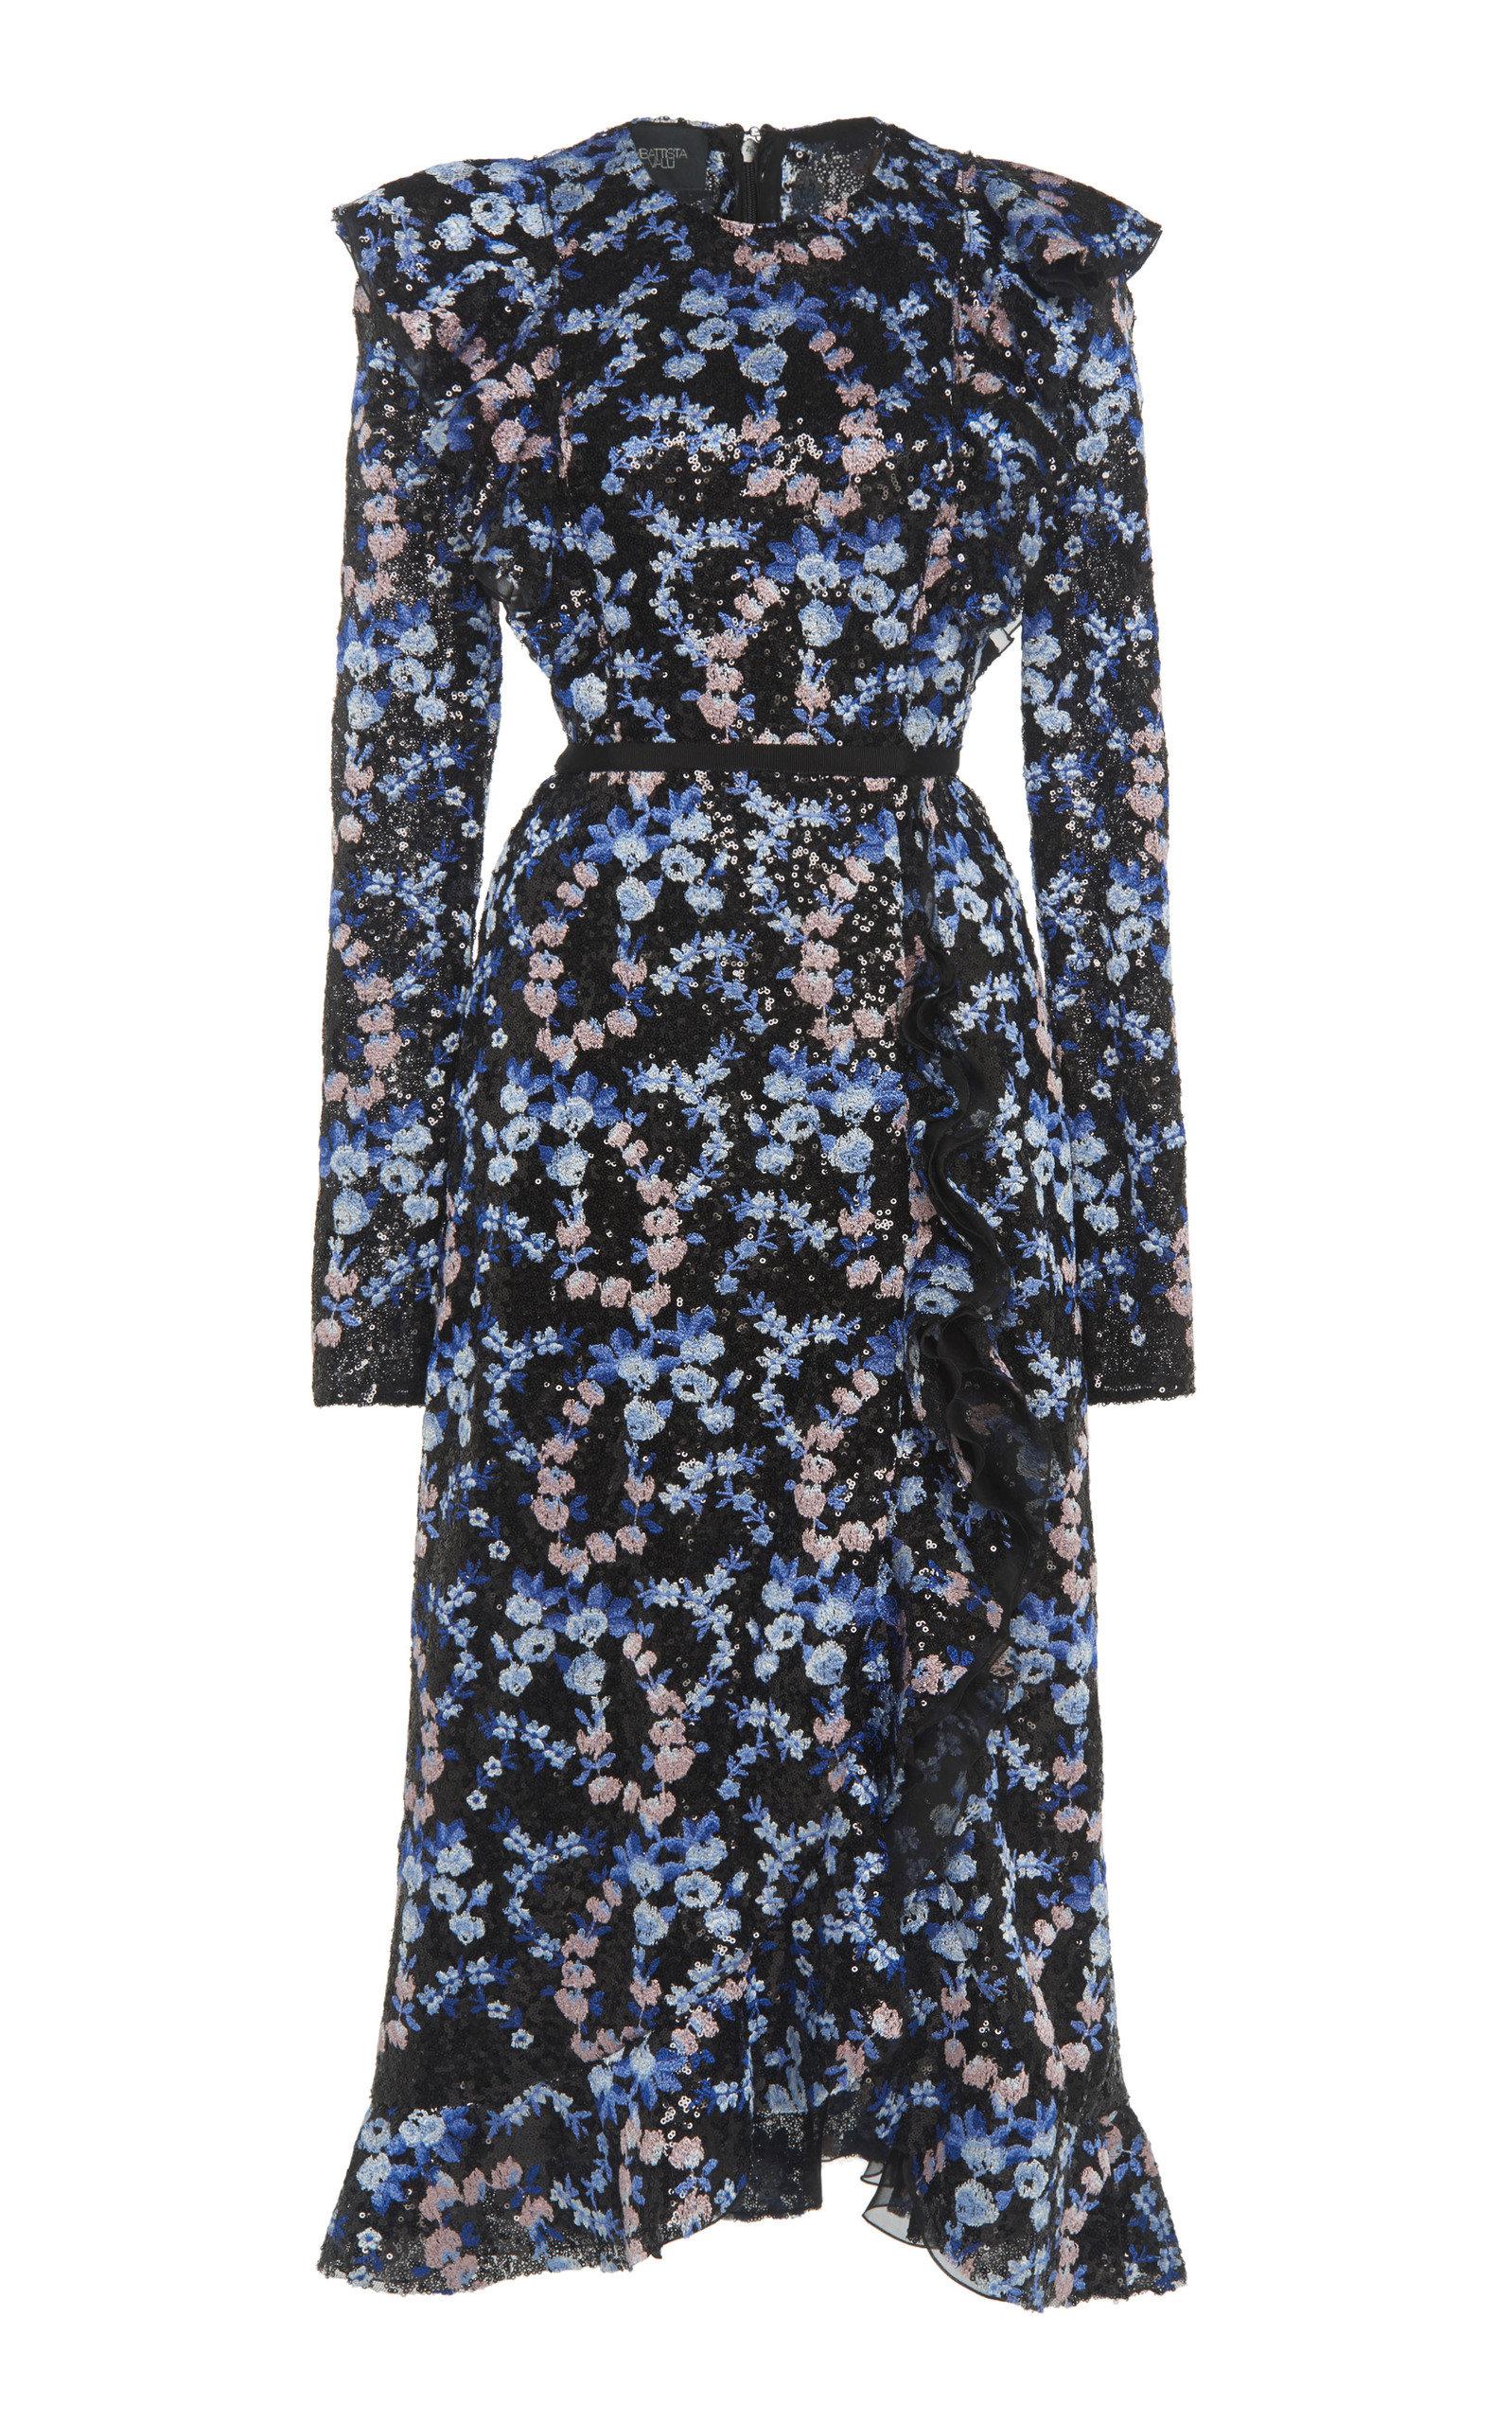 Buy Giambattista Valli Sequined Floral Chiffon Dress online, shop Giambattista Valli at the best price